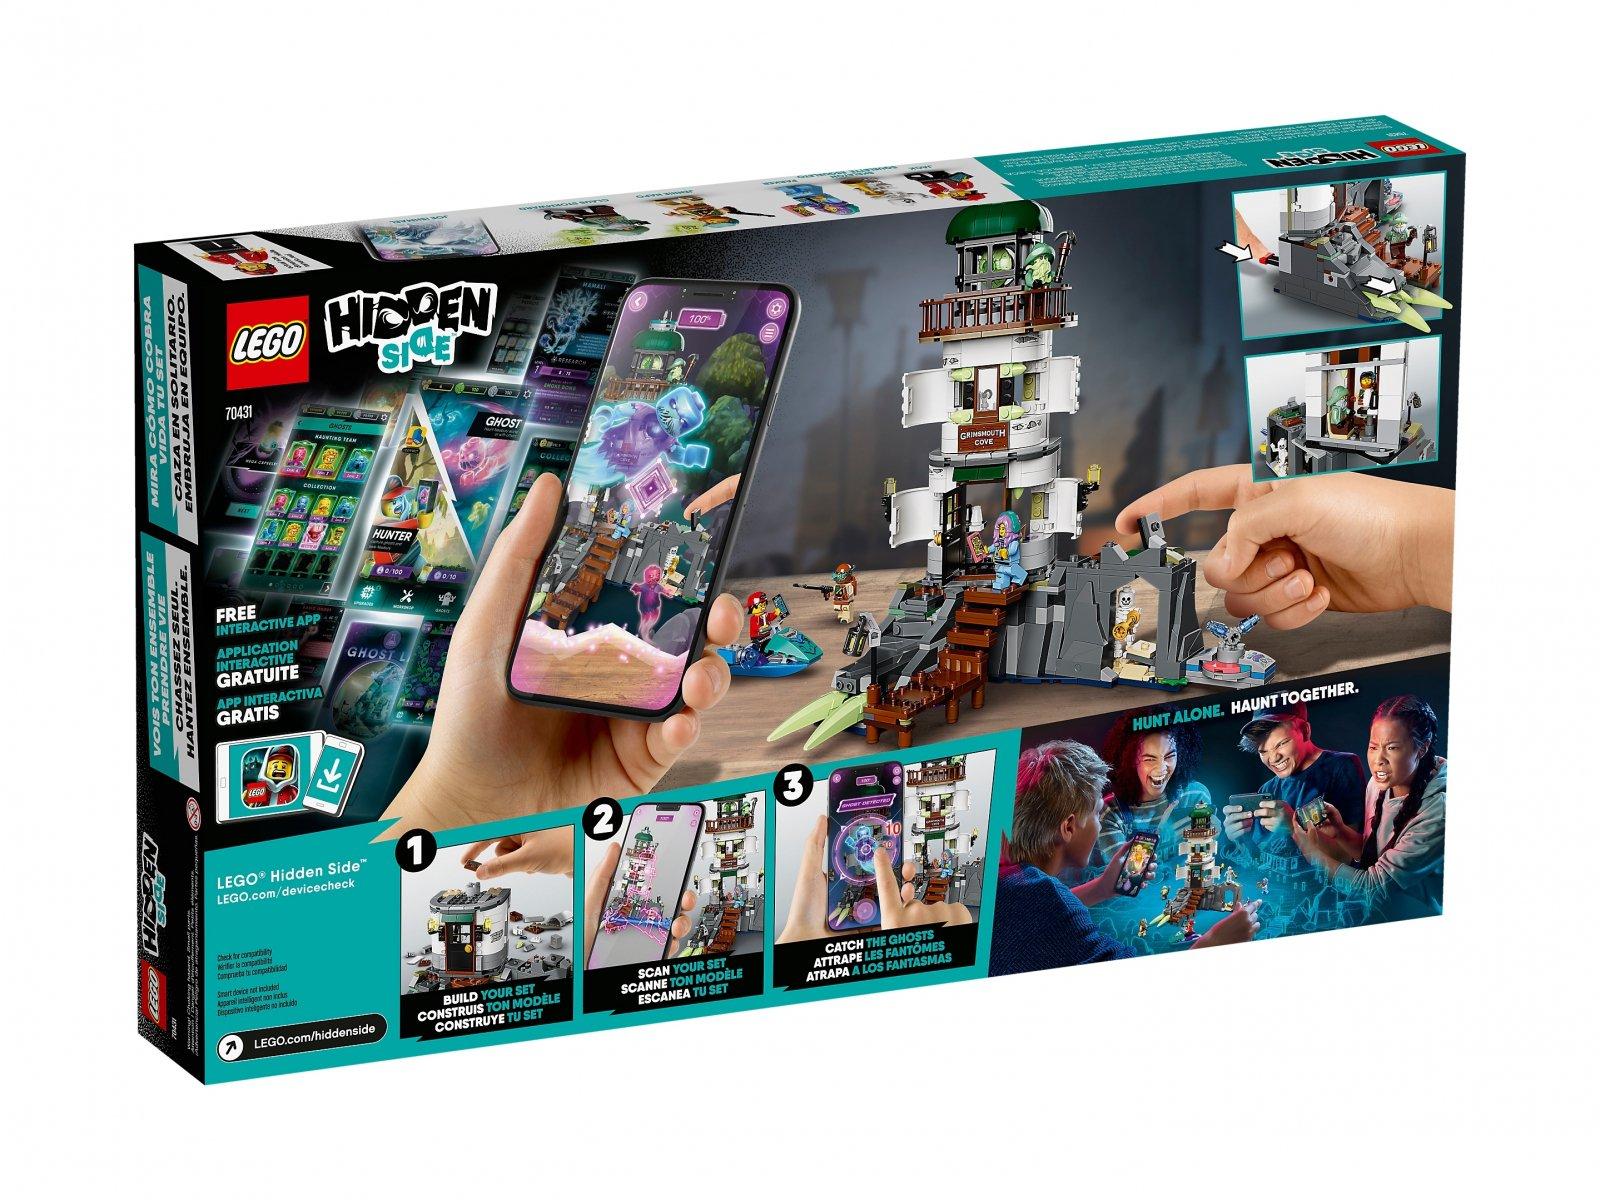 LEGO 70431 Hidden Side™ Latarnia ciemności